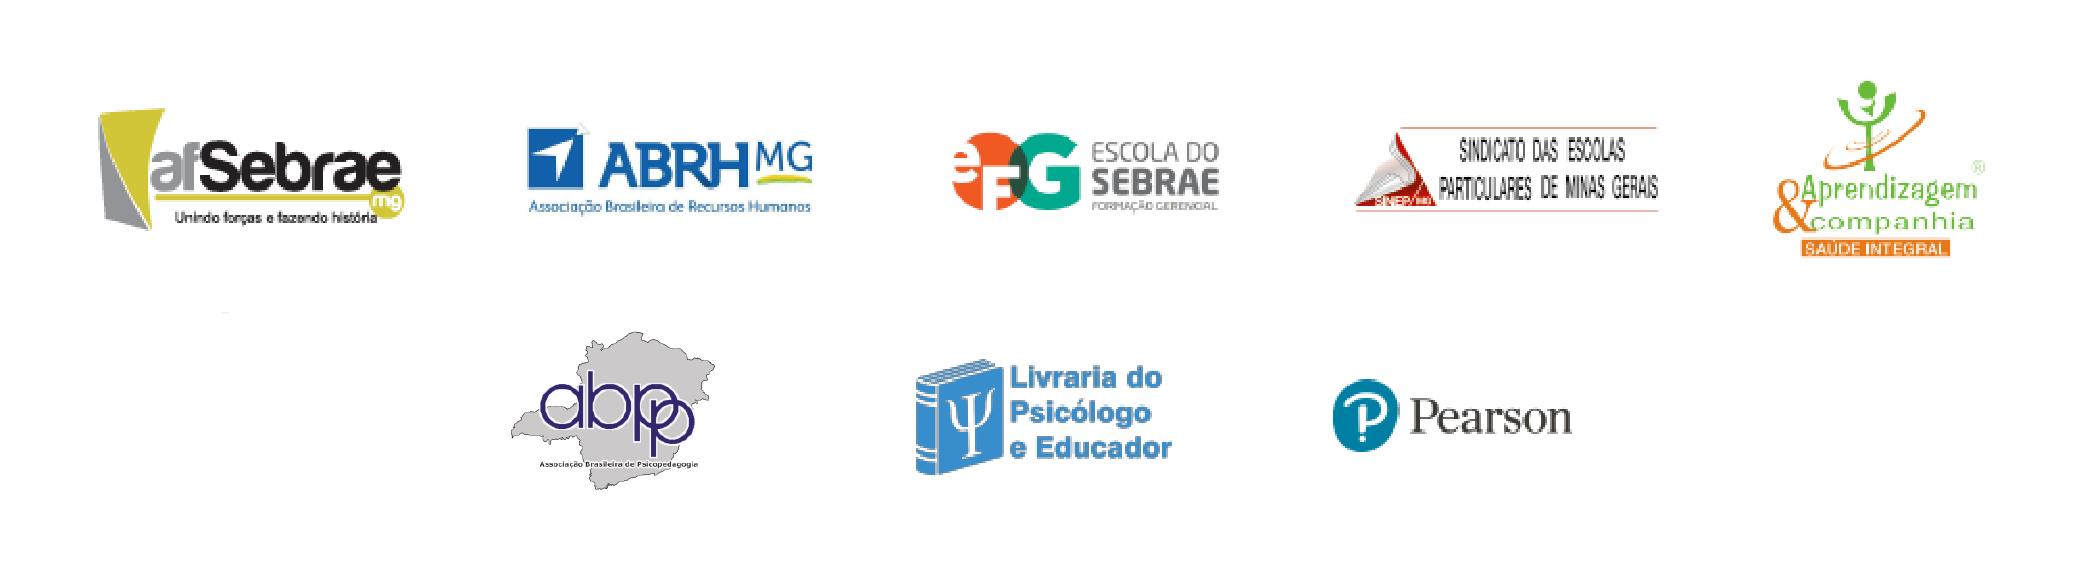 logos site-01